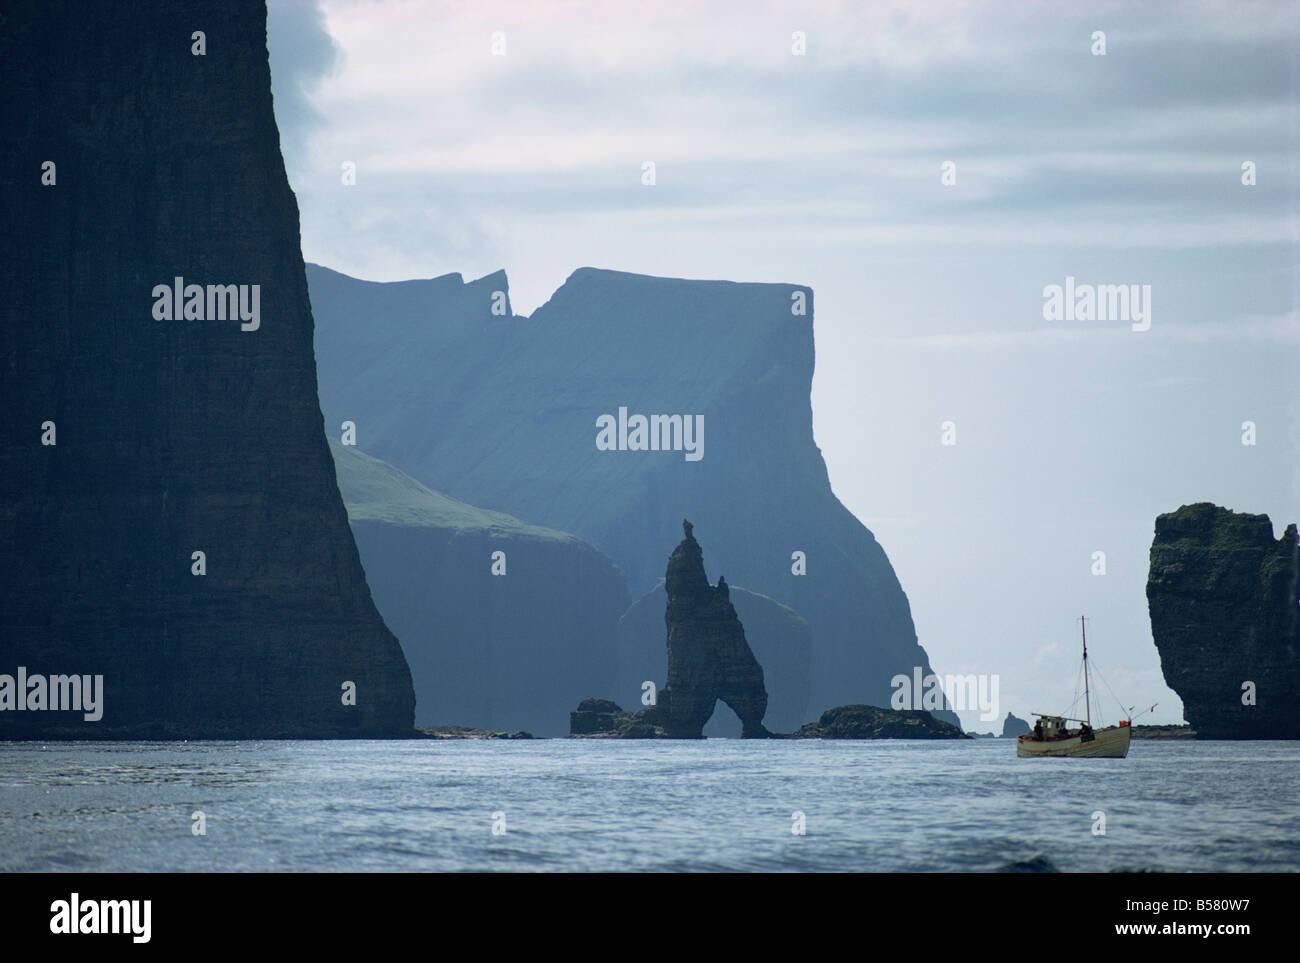 Small fishing boat before a towering cliff coastline, Faroe Islands, Denmark, Atlantic, Europe - Stock Image